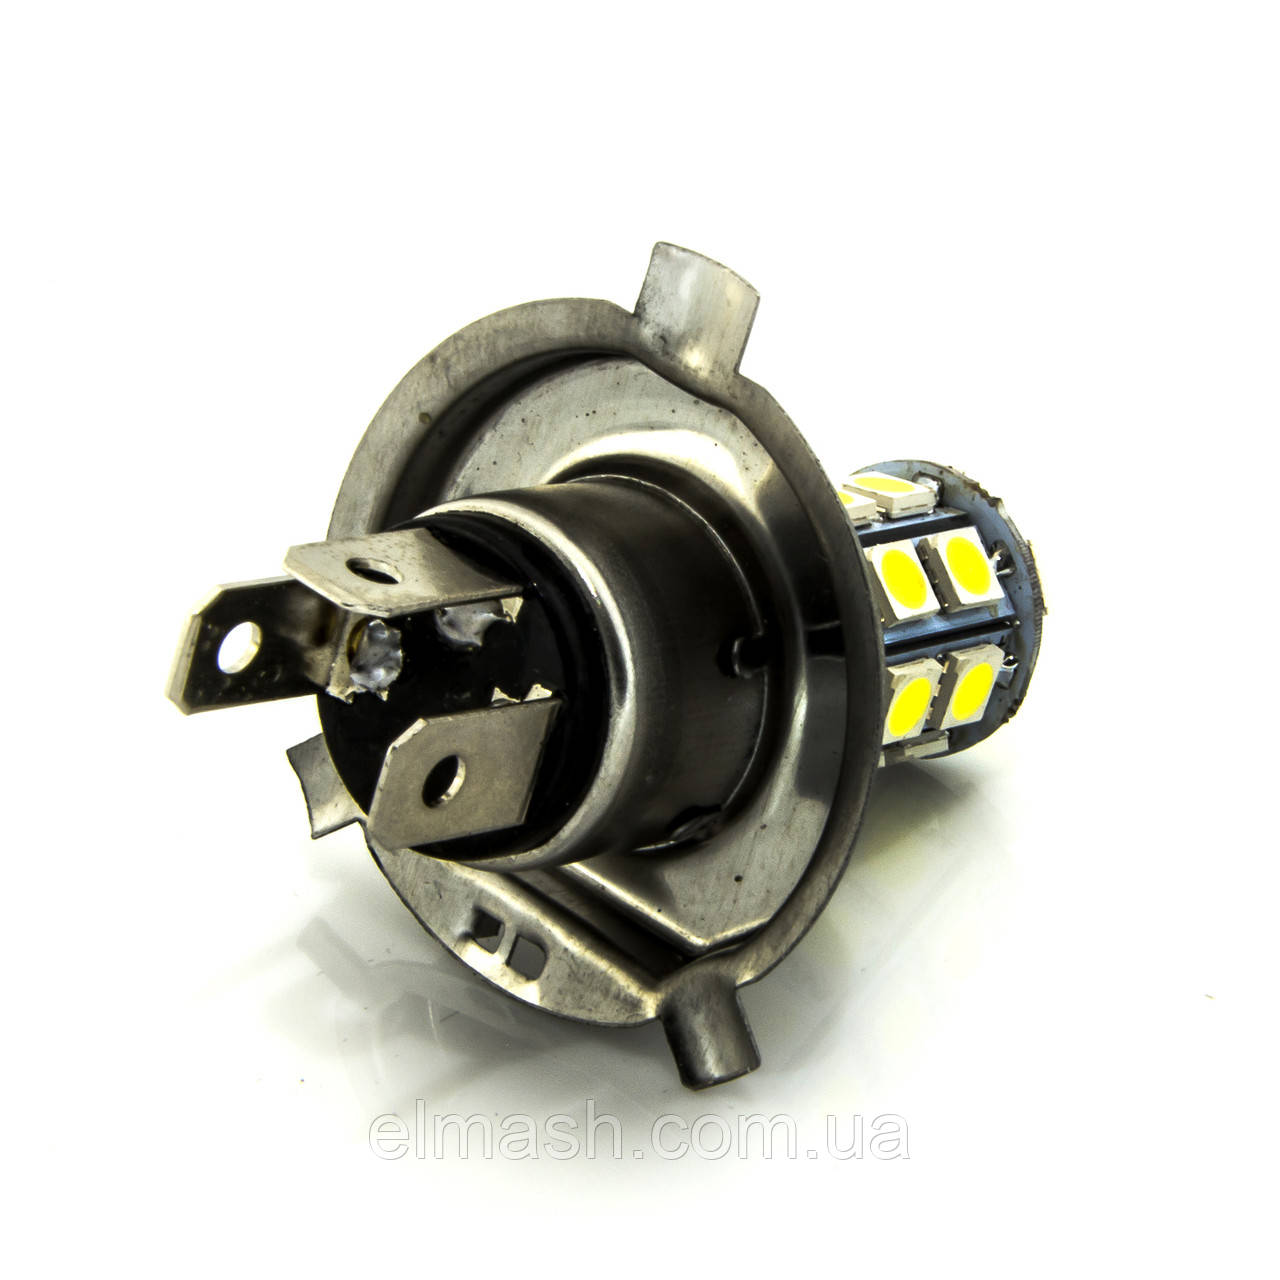 Лампа LED 24V H4 27SMD 5050 белый 60/280Lm